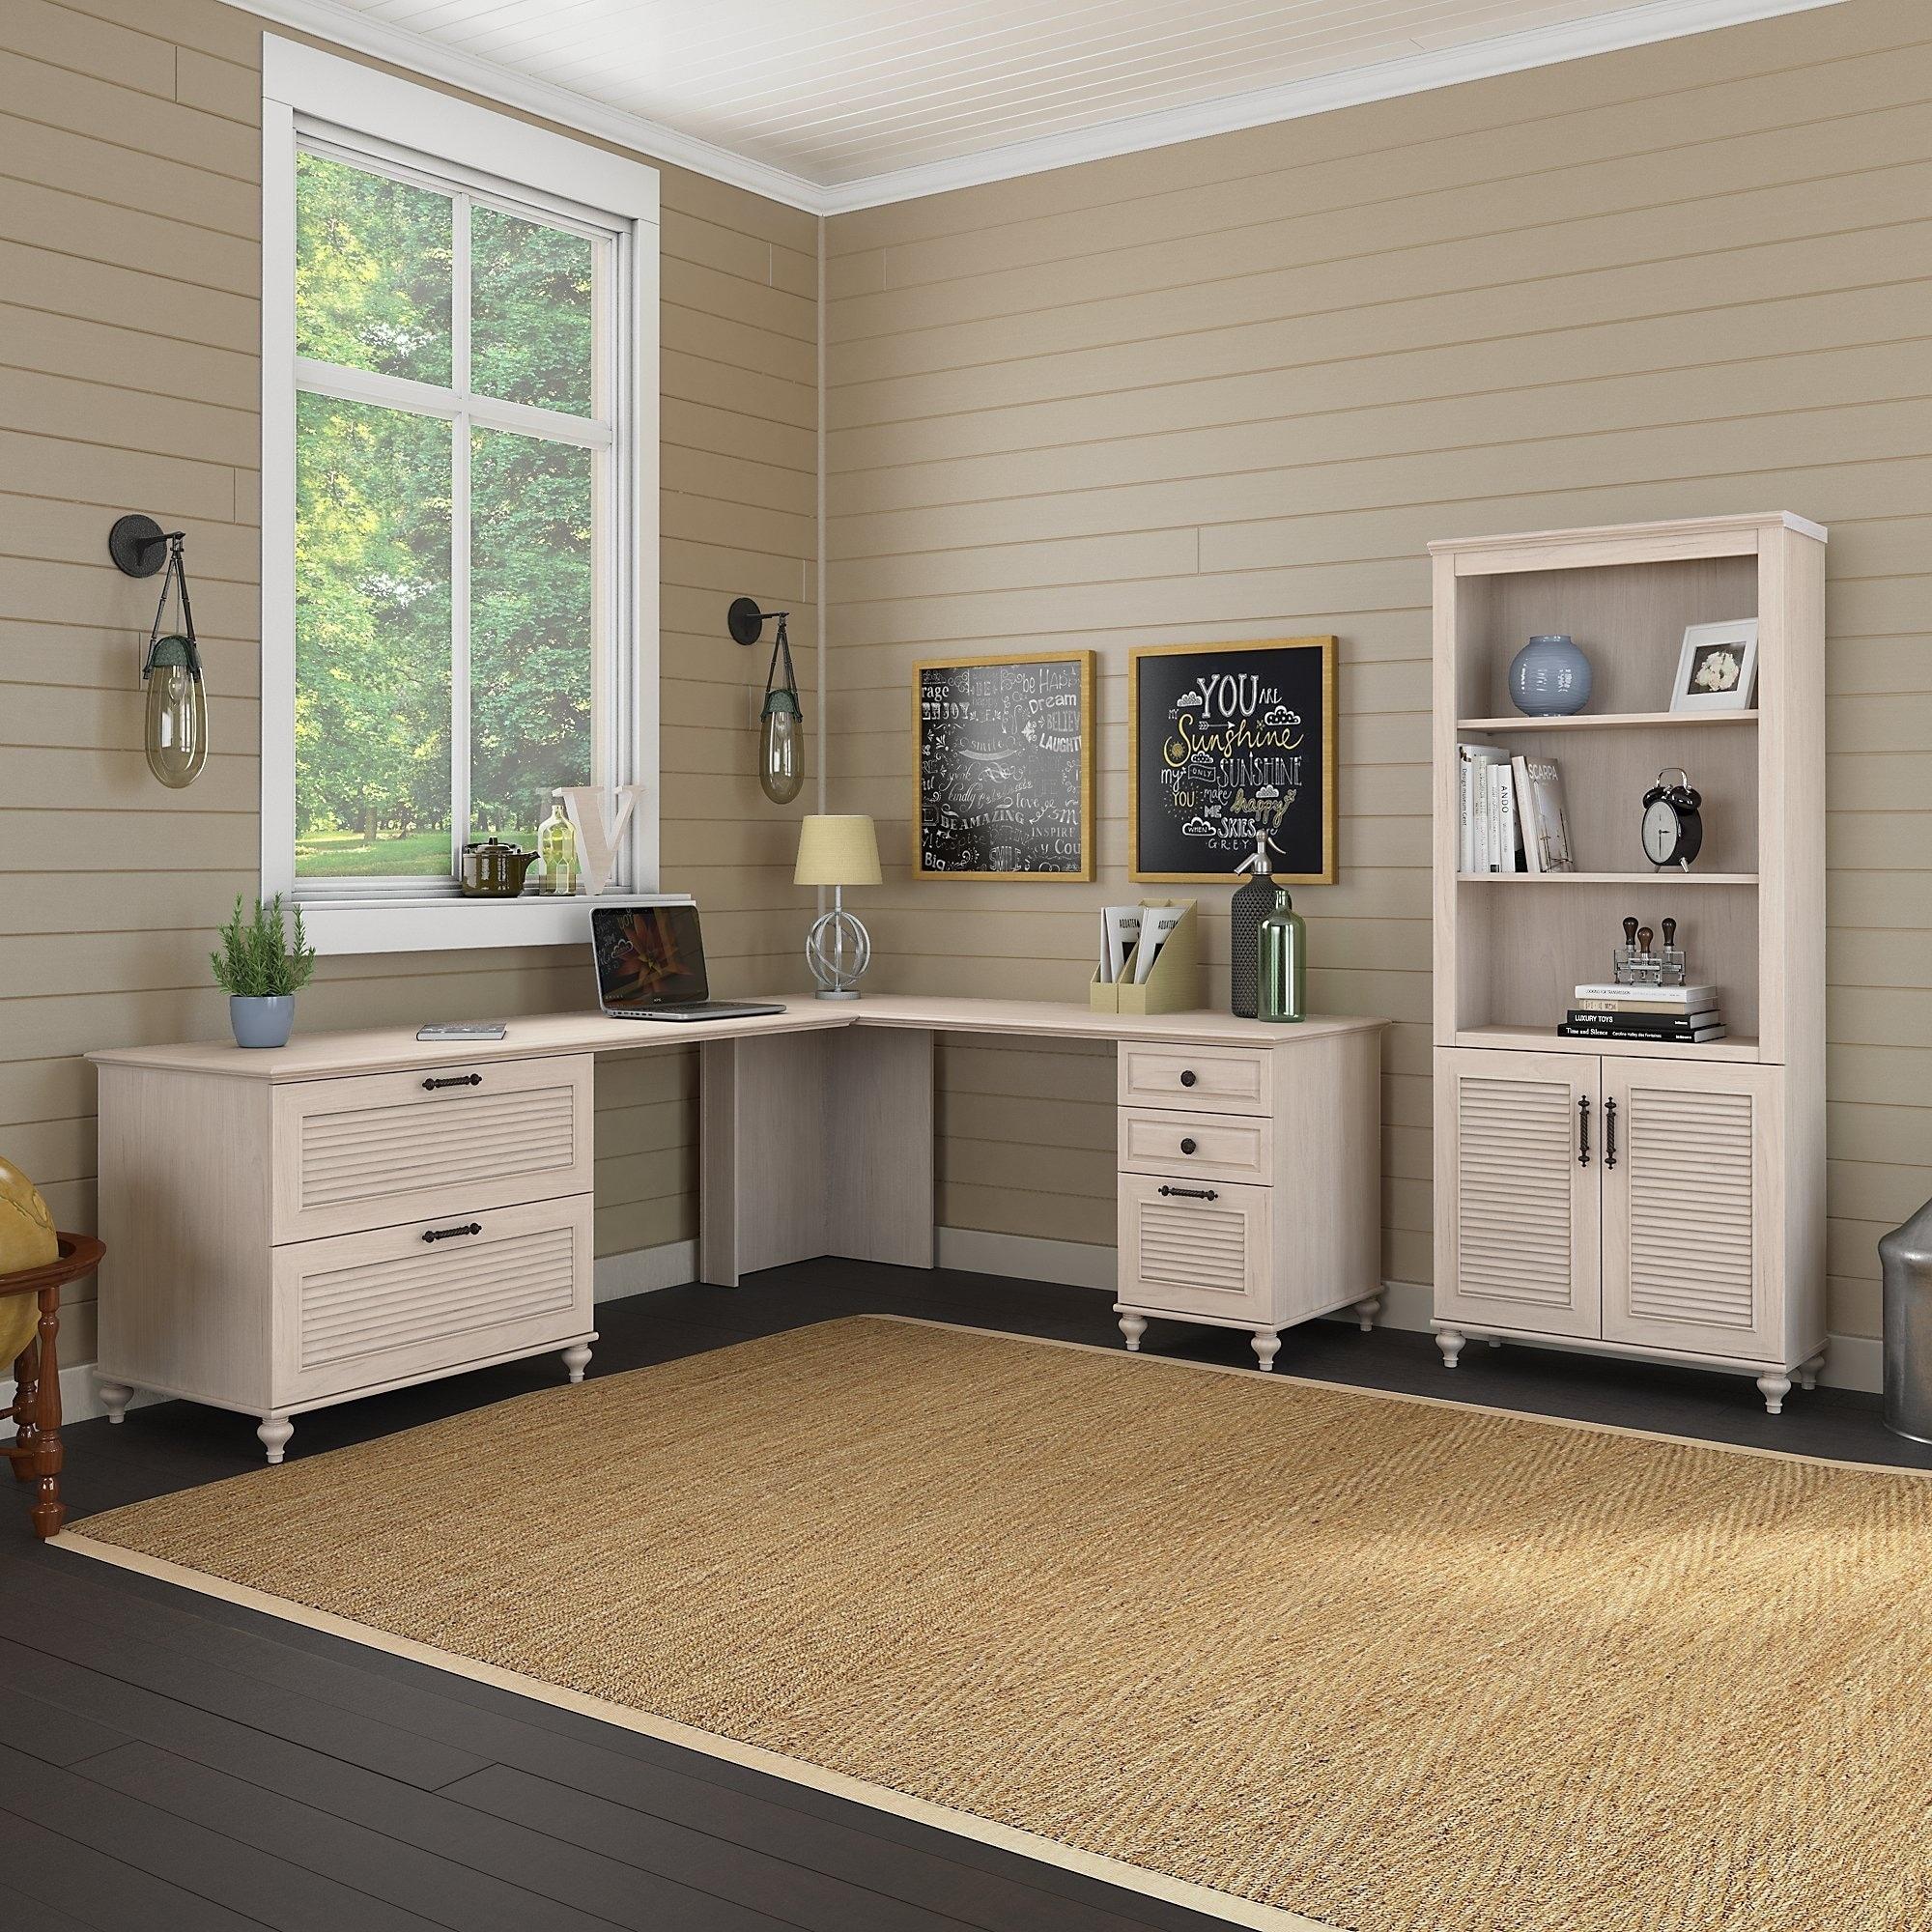 Kathy ireland office volcano dusk 68w x 91d l shaped desk office suite